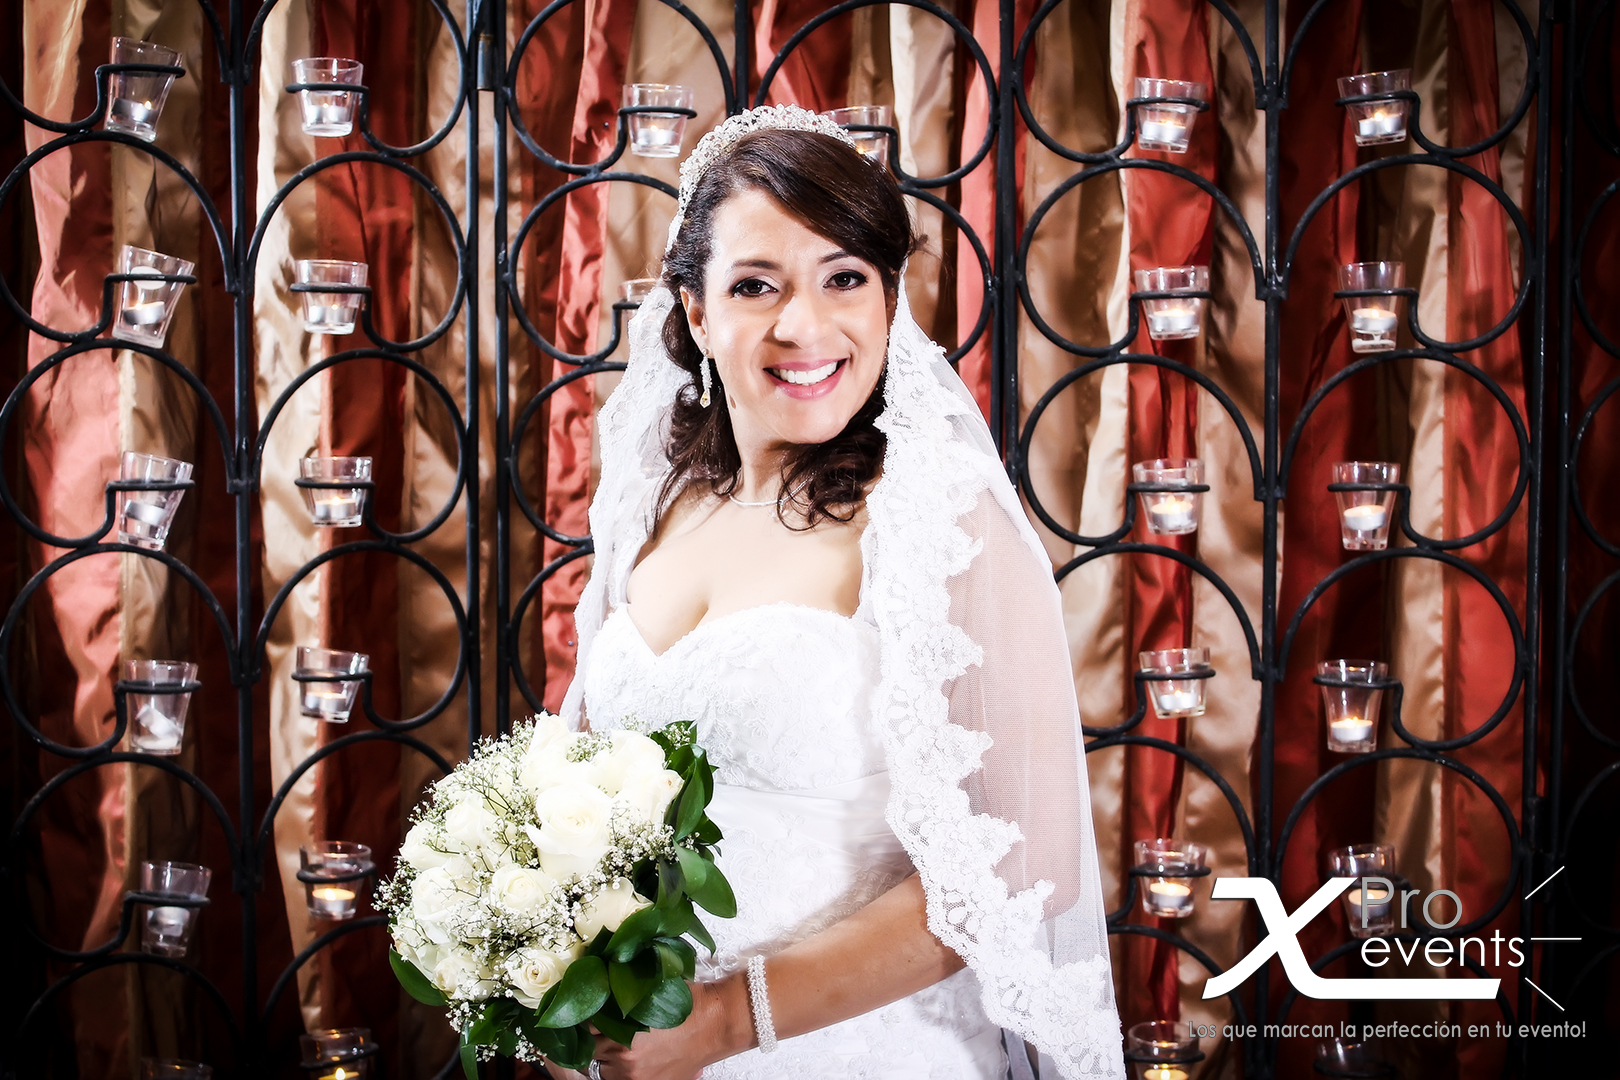 www.Xproevents.com - Novia Ruth Santos en el Hotel Hilton 2.jpg